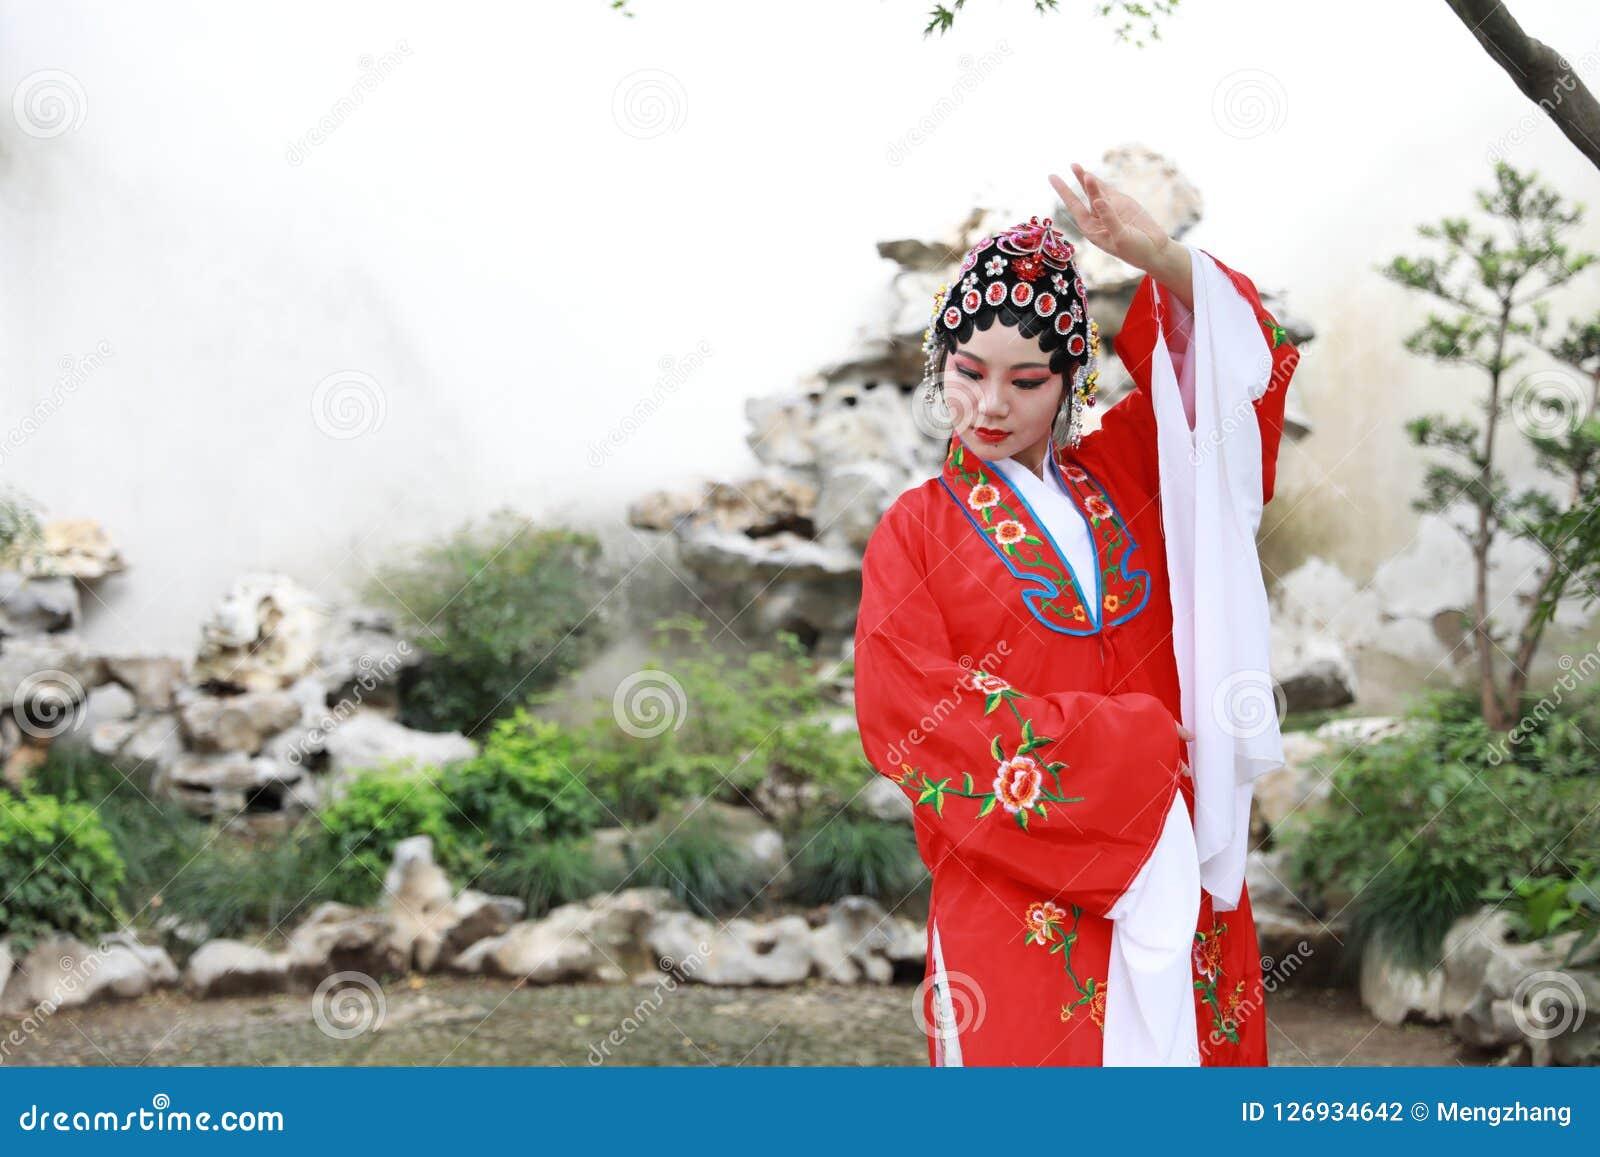 Aisa Chinese opera female Peking Beijing Opera Pavilion garden outdoor china traditional costume bride role drama play